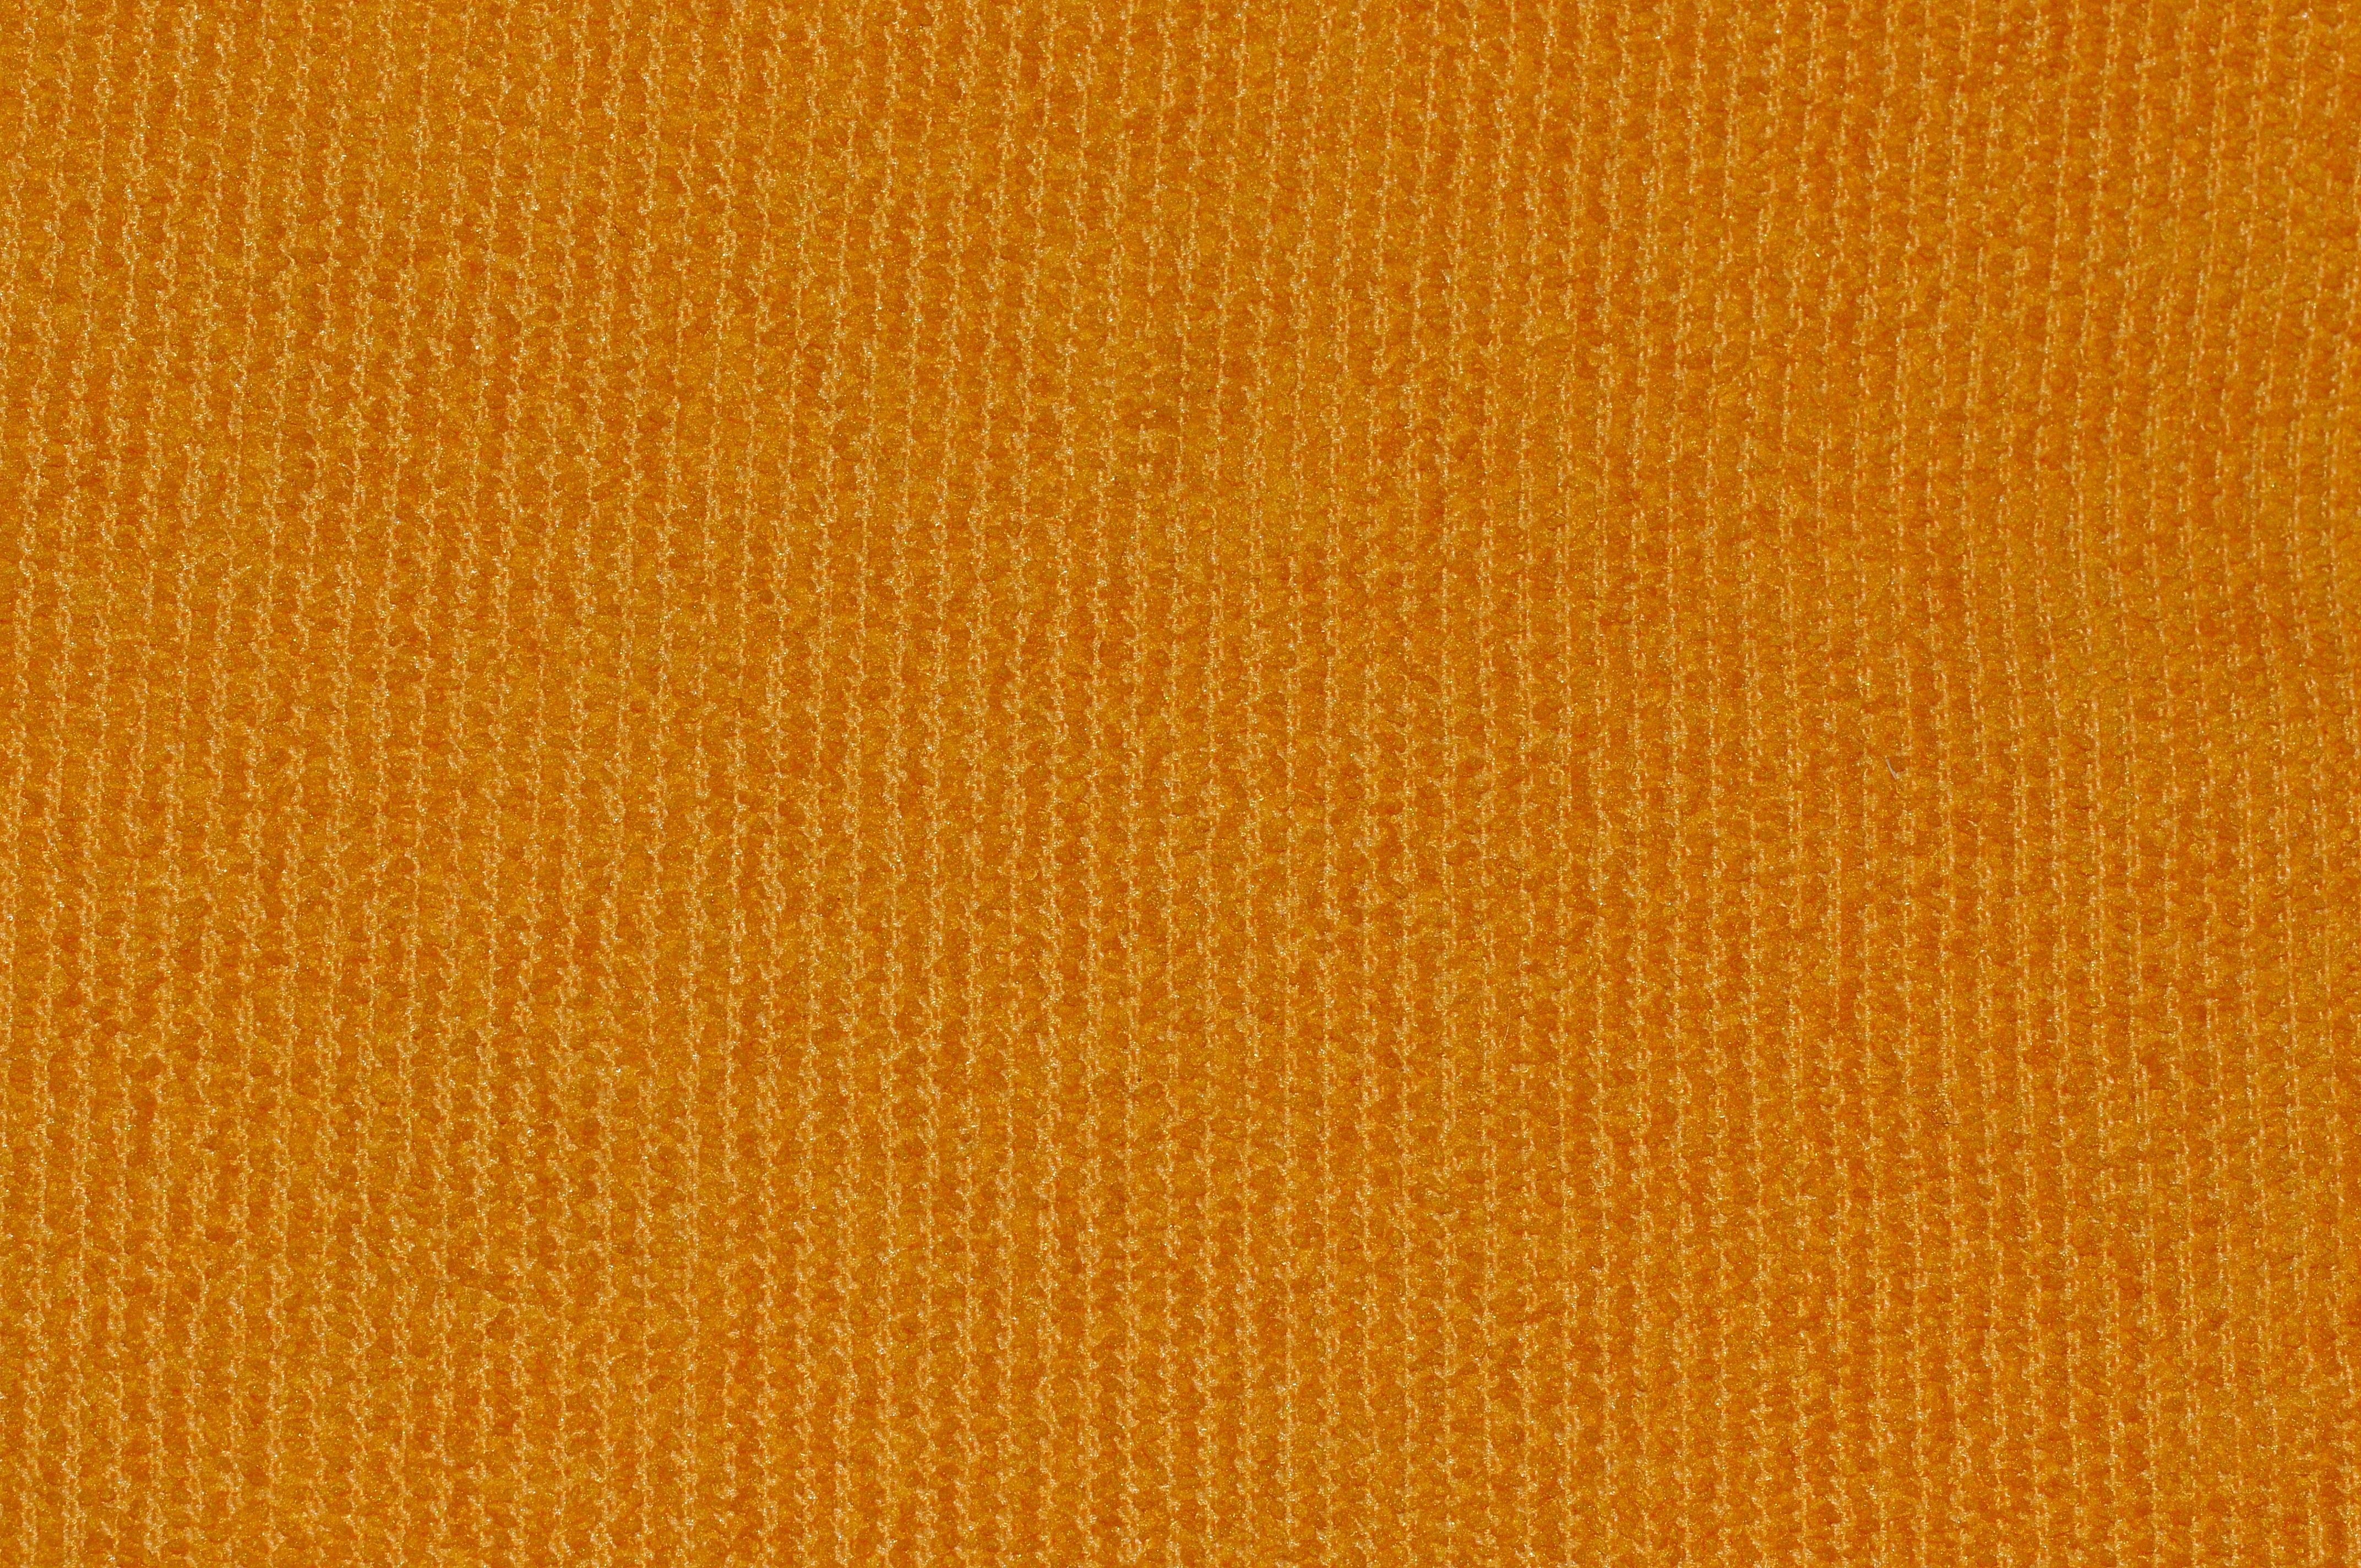 Free Images : structure, texture, floor, orange, pattern, brown ...